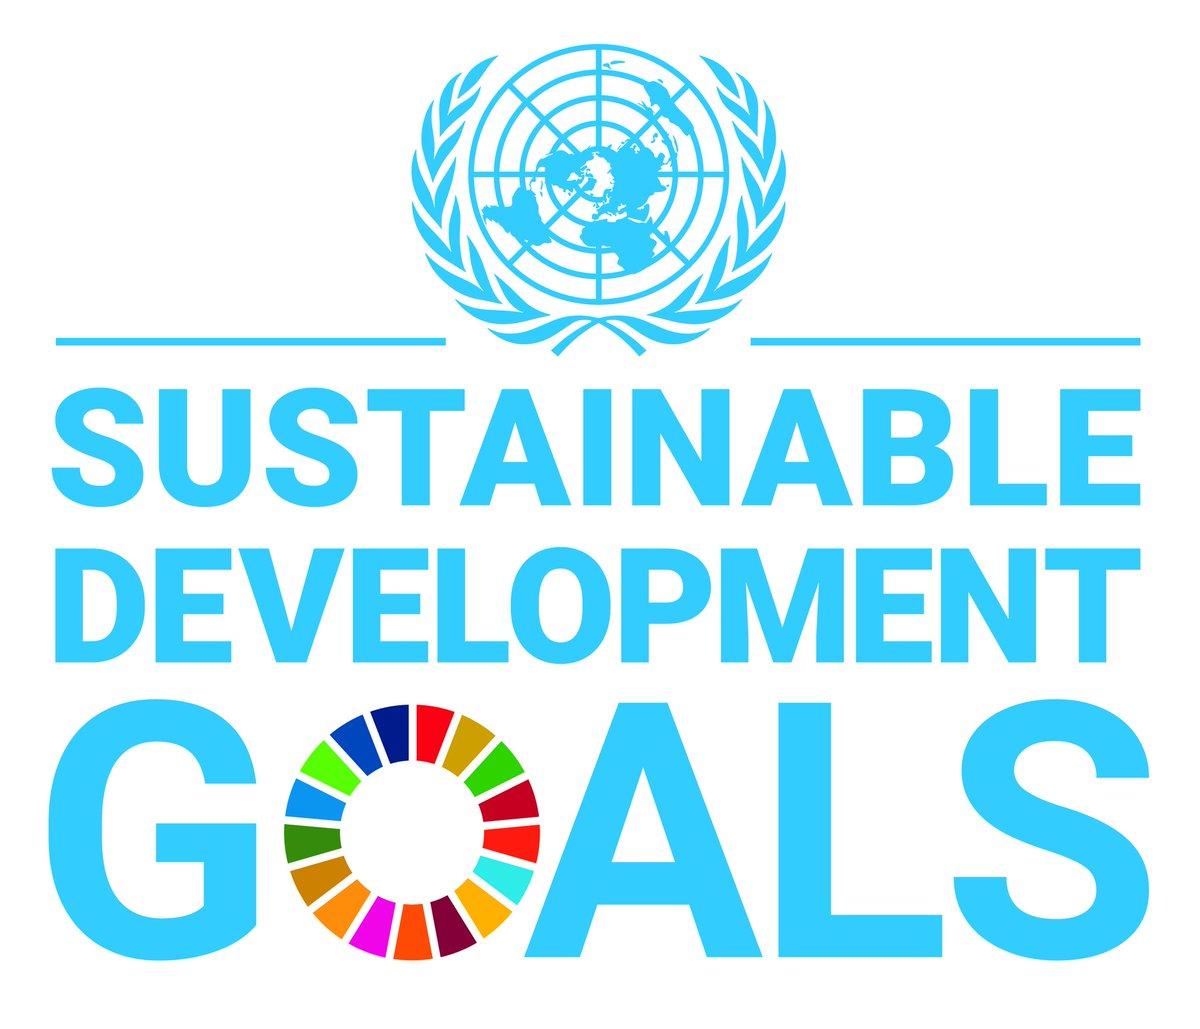 Today we are saying, HAPPY BIRTHDAY #SDGs. Feliz cumpleaños #SDGs. Bon anniversaire #SDGs.  The 193-Member United Nations General Assembly formally adopted the 2030 Agenda forSustainable Developmenton 25September 2015. @SDG2030 @SDGoals @SDGsKenyaForum @AdamRogers2030 @Dr_Jim1 https://t.co/XaiMM508qz